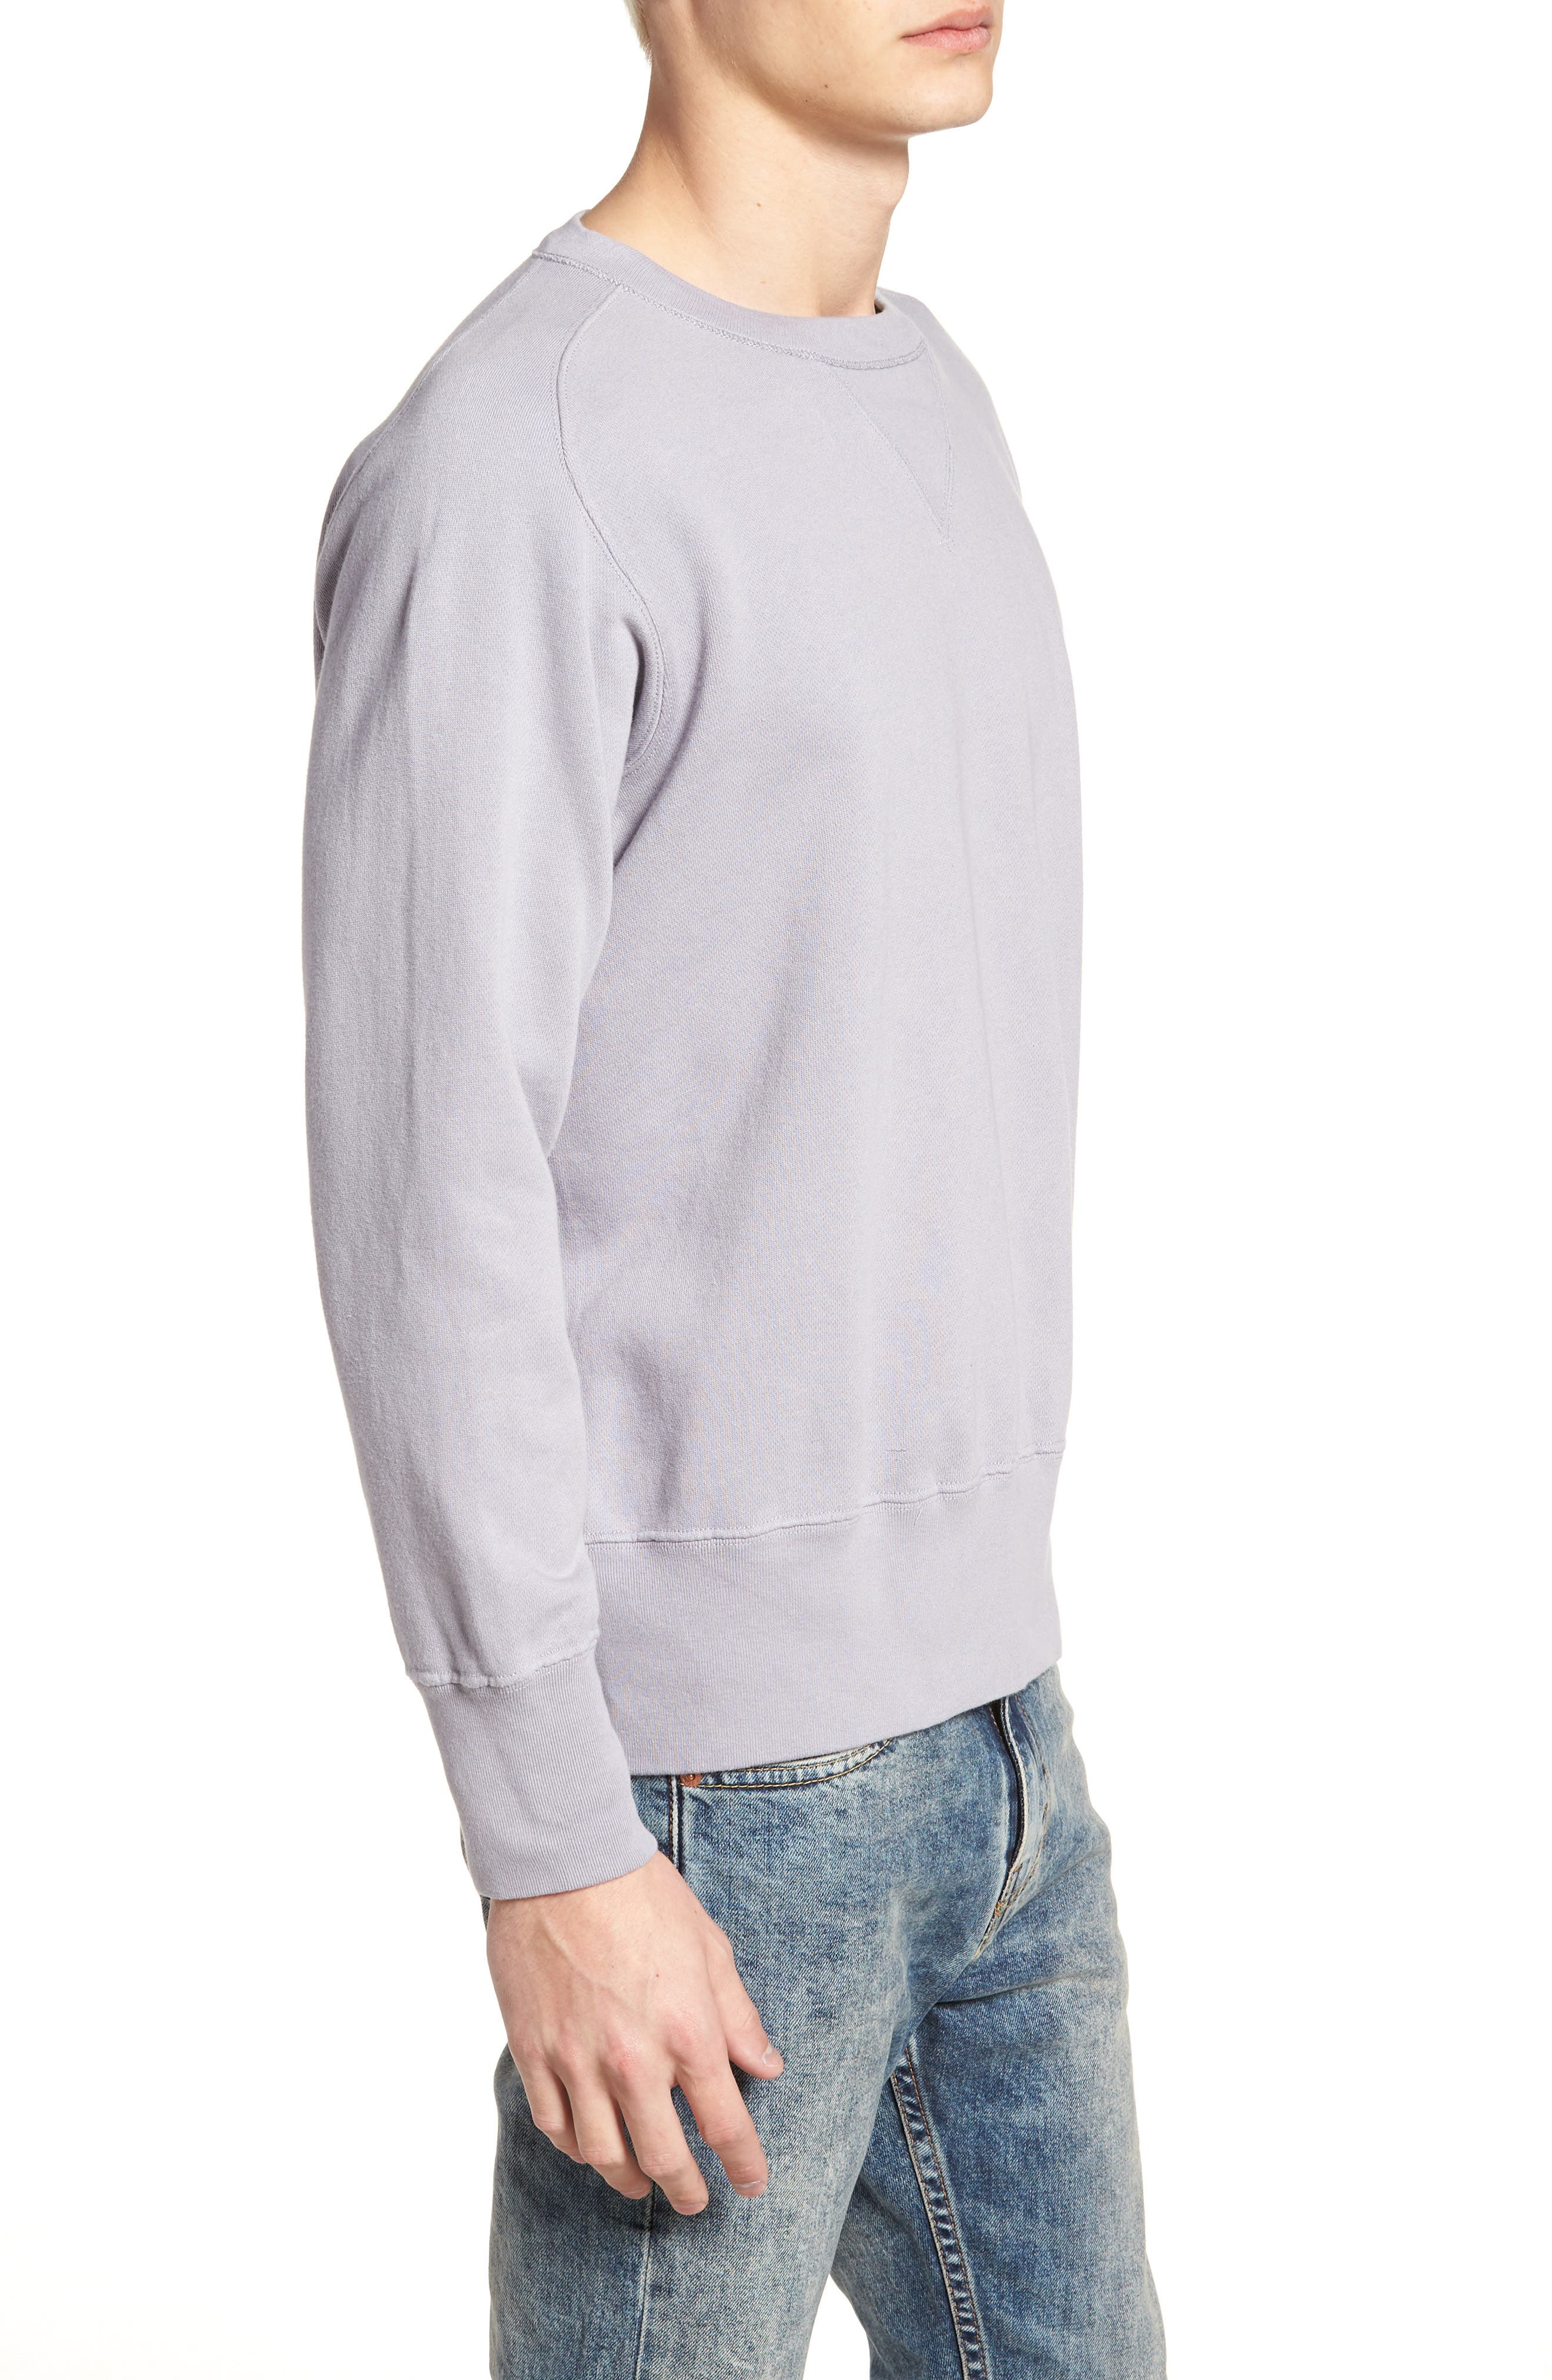 Bay Meadows Sweatshirt,                             Alternate thumbnail 3, color,                             Quiksilver